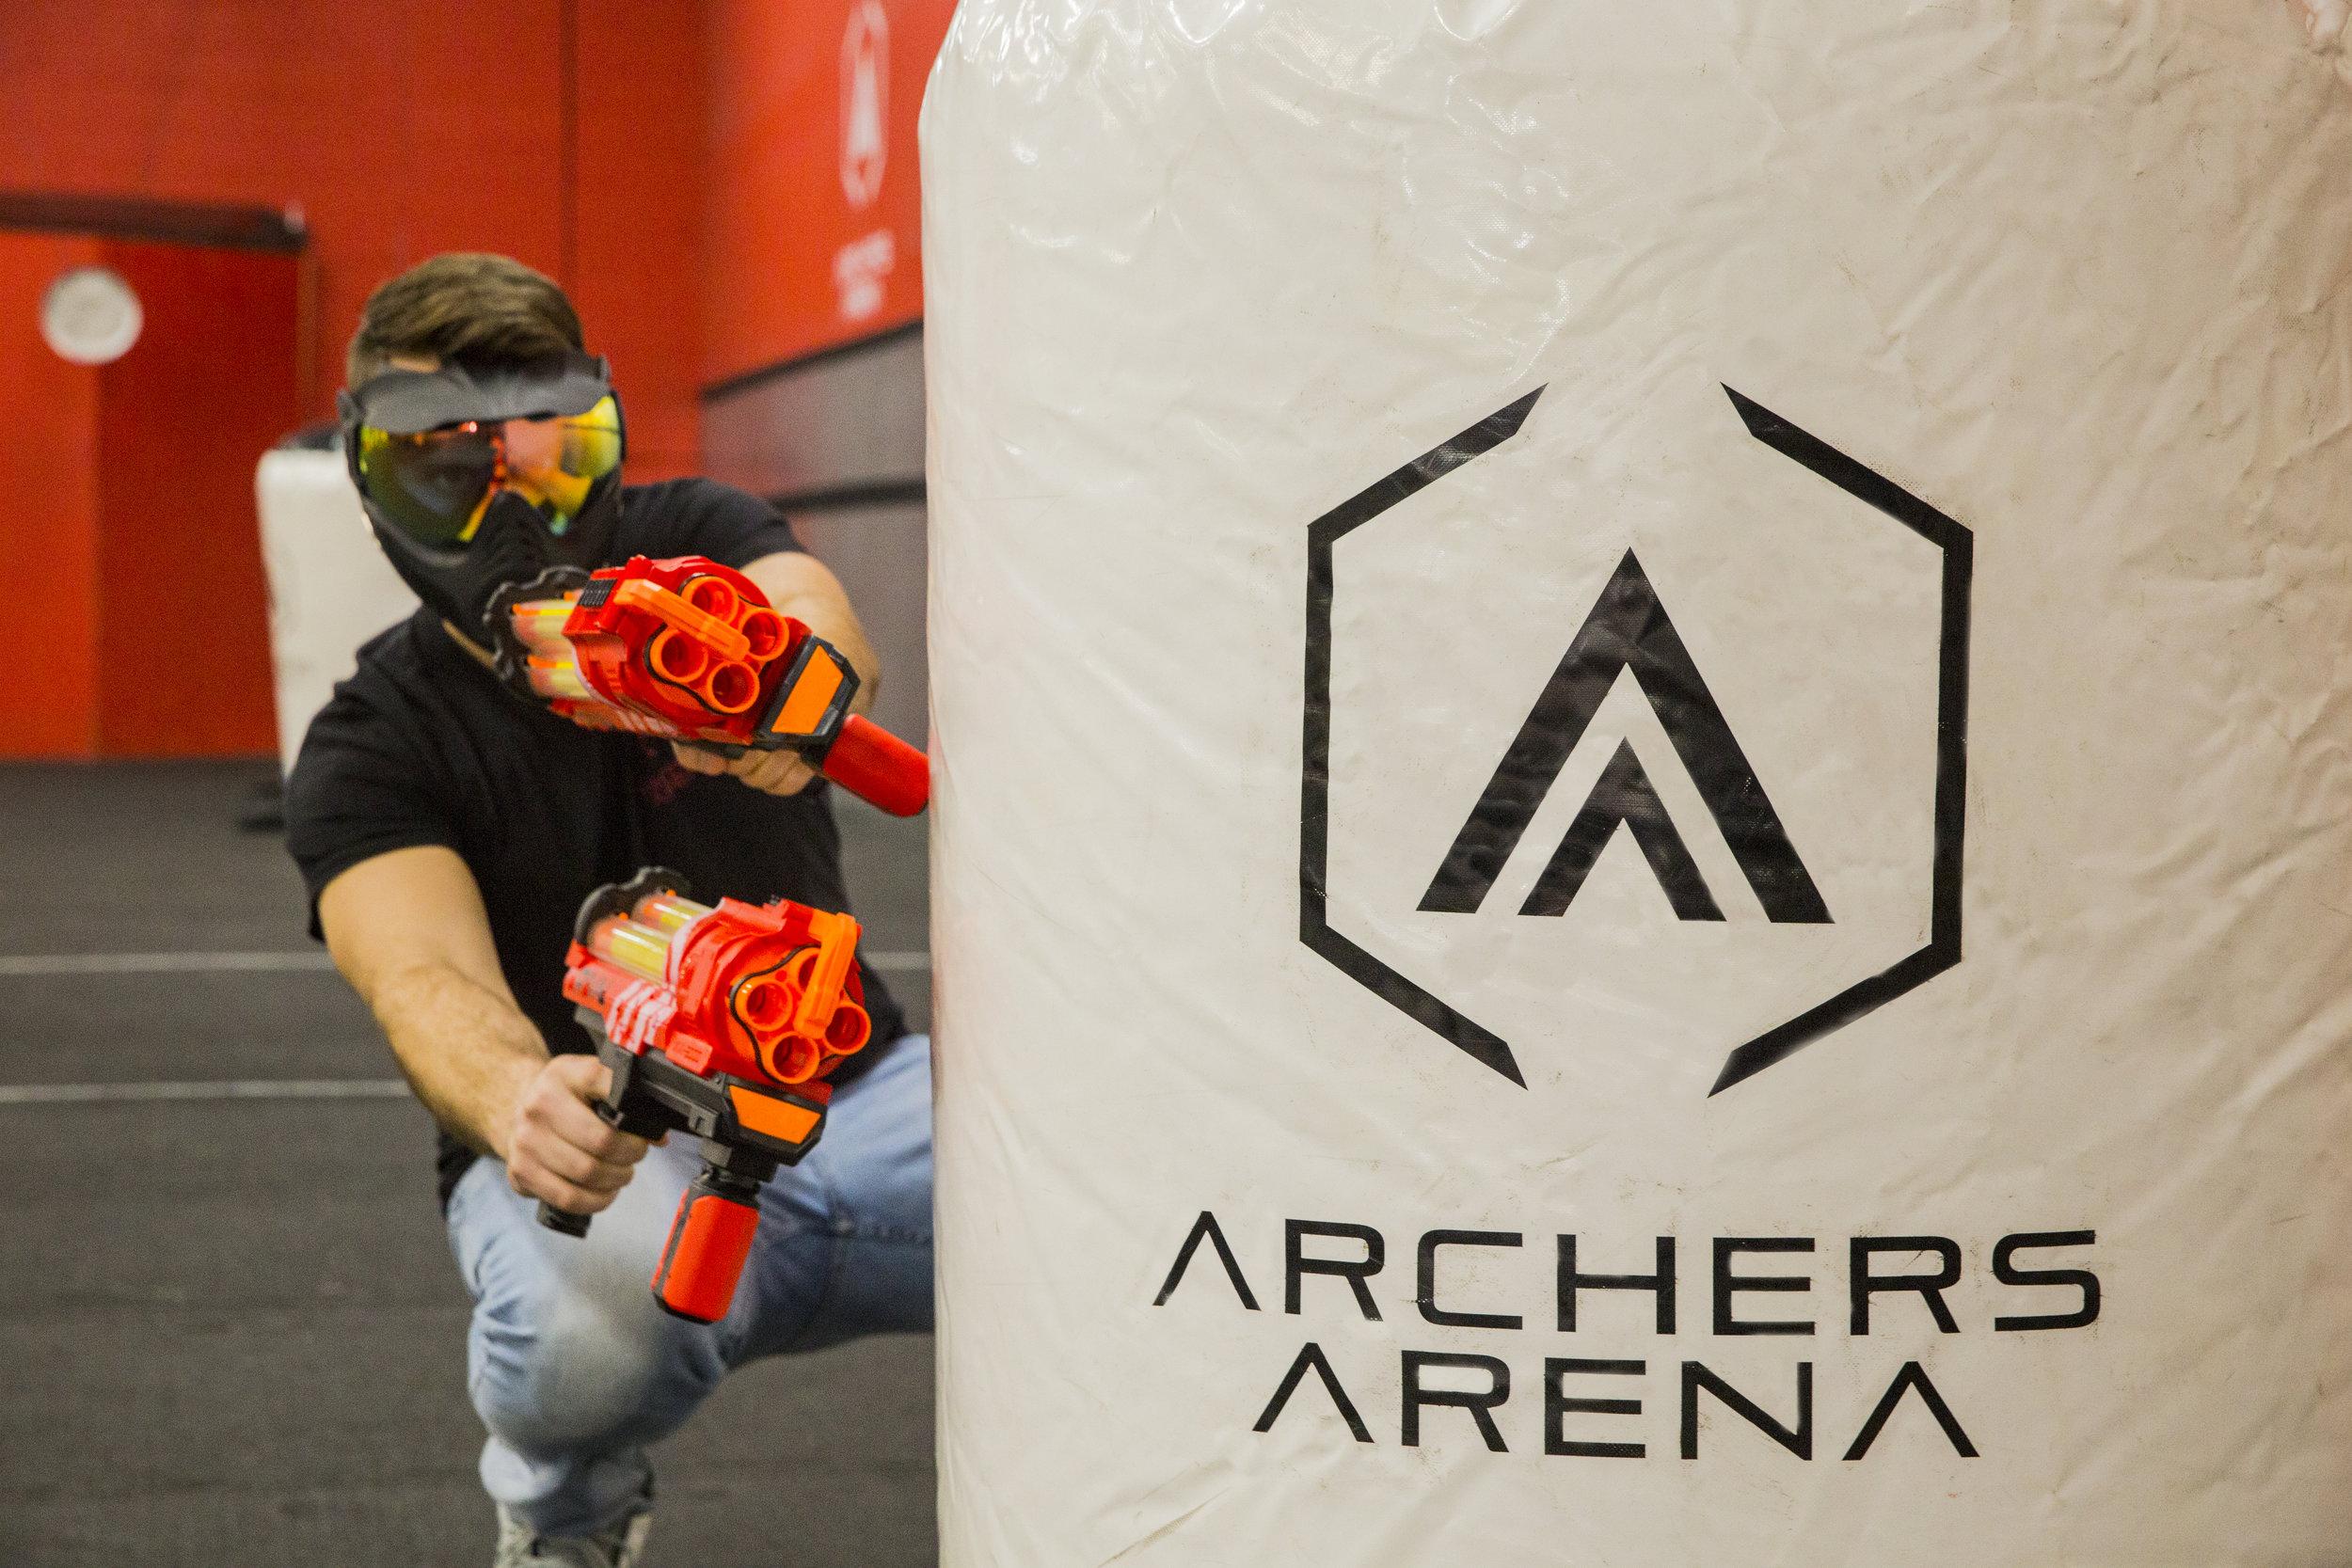 toronto archers arena strongarm nerf wars battle.jpg